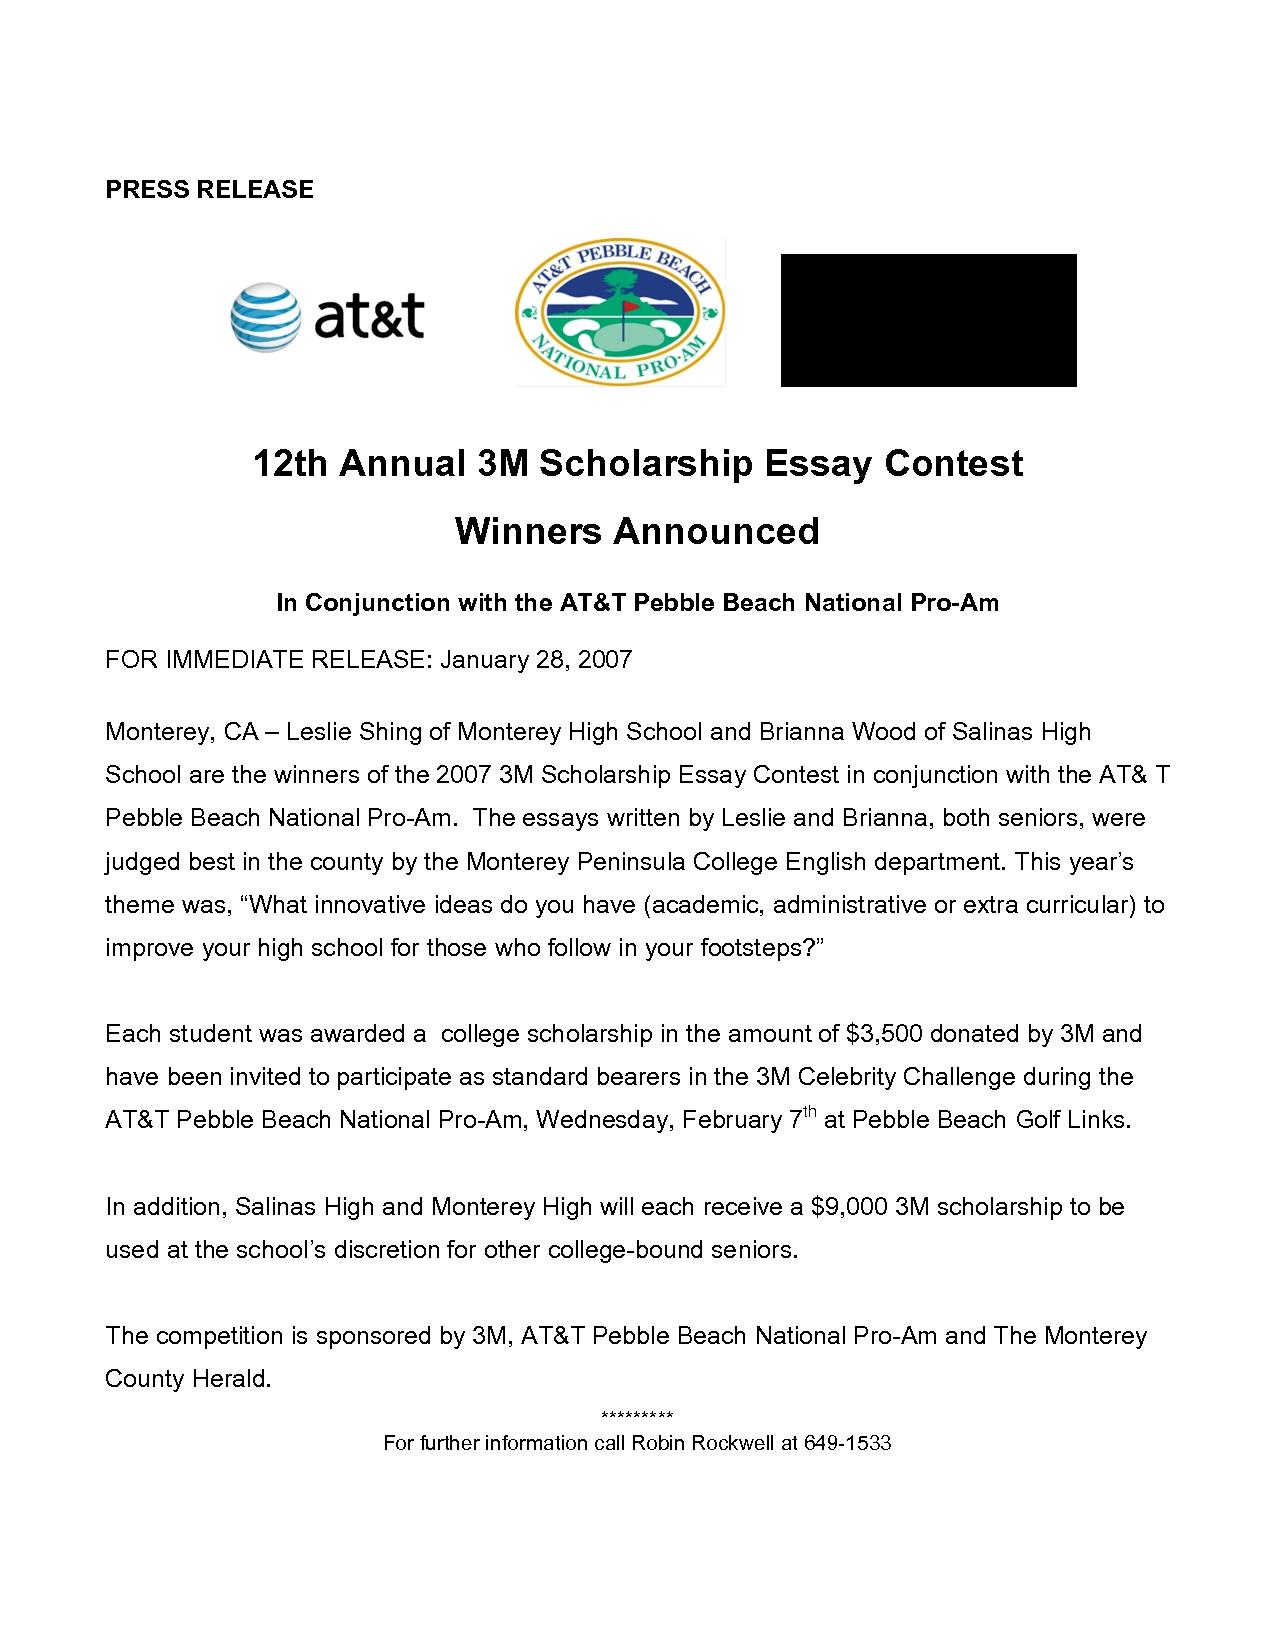 npg scholarship essay contest